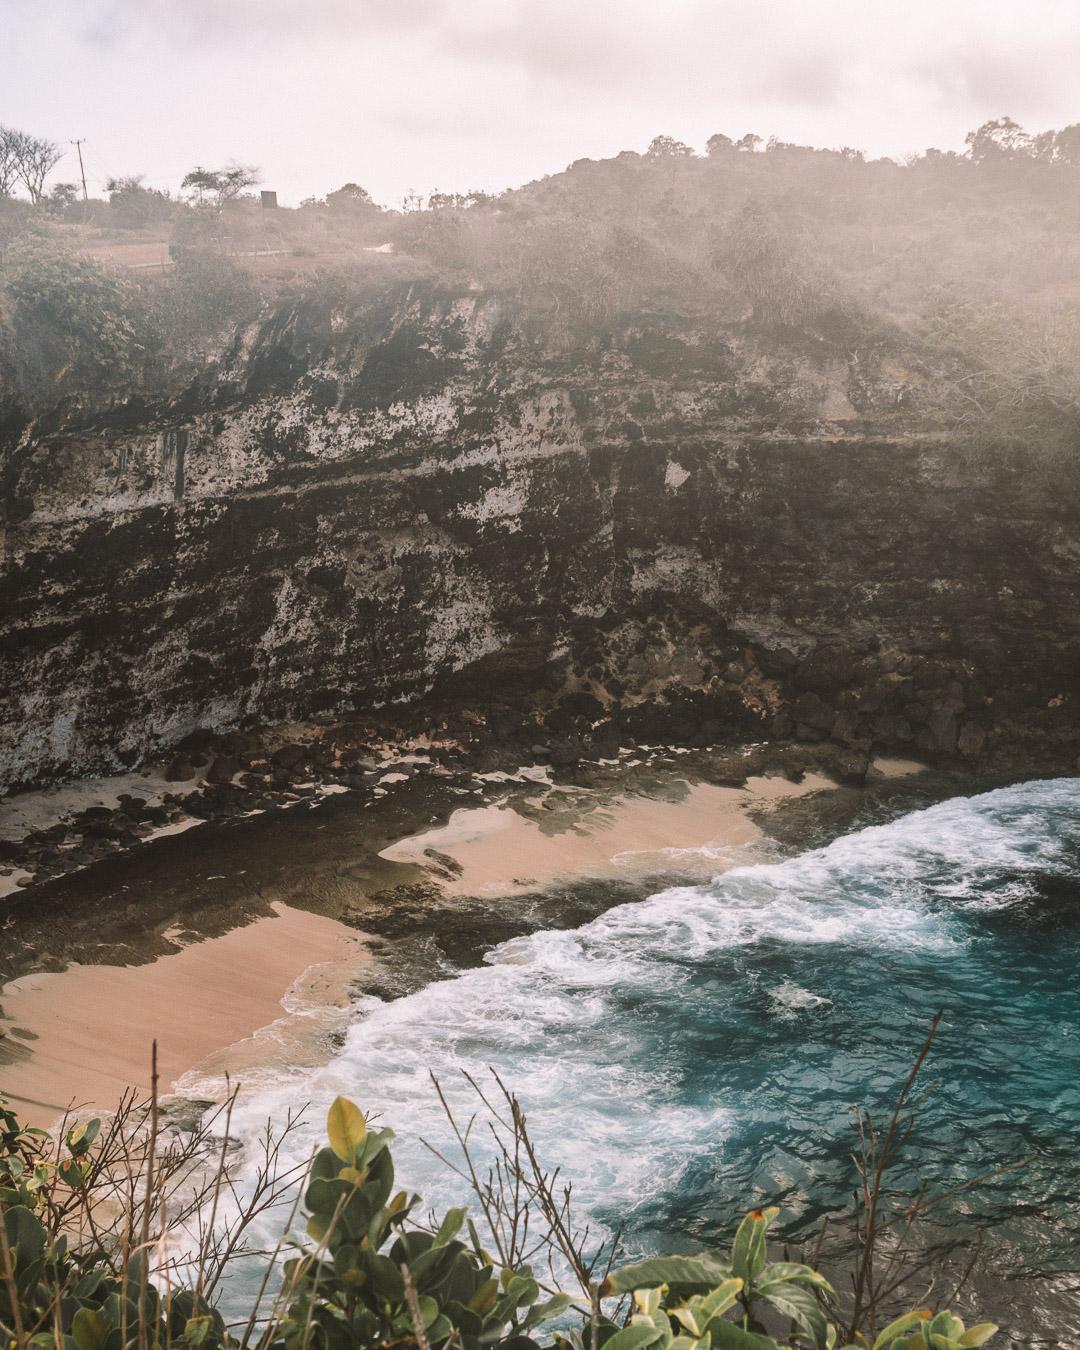 travel guide to Nusa Penida island Bali indonesia freeoversea couple tropical destination broken beach ocean rock formation